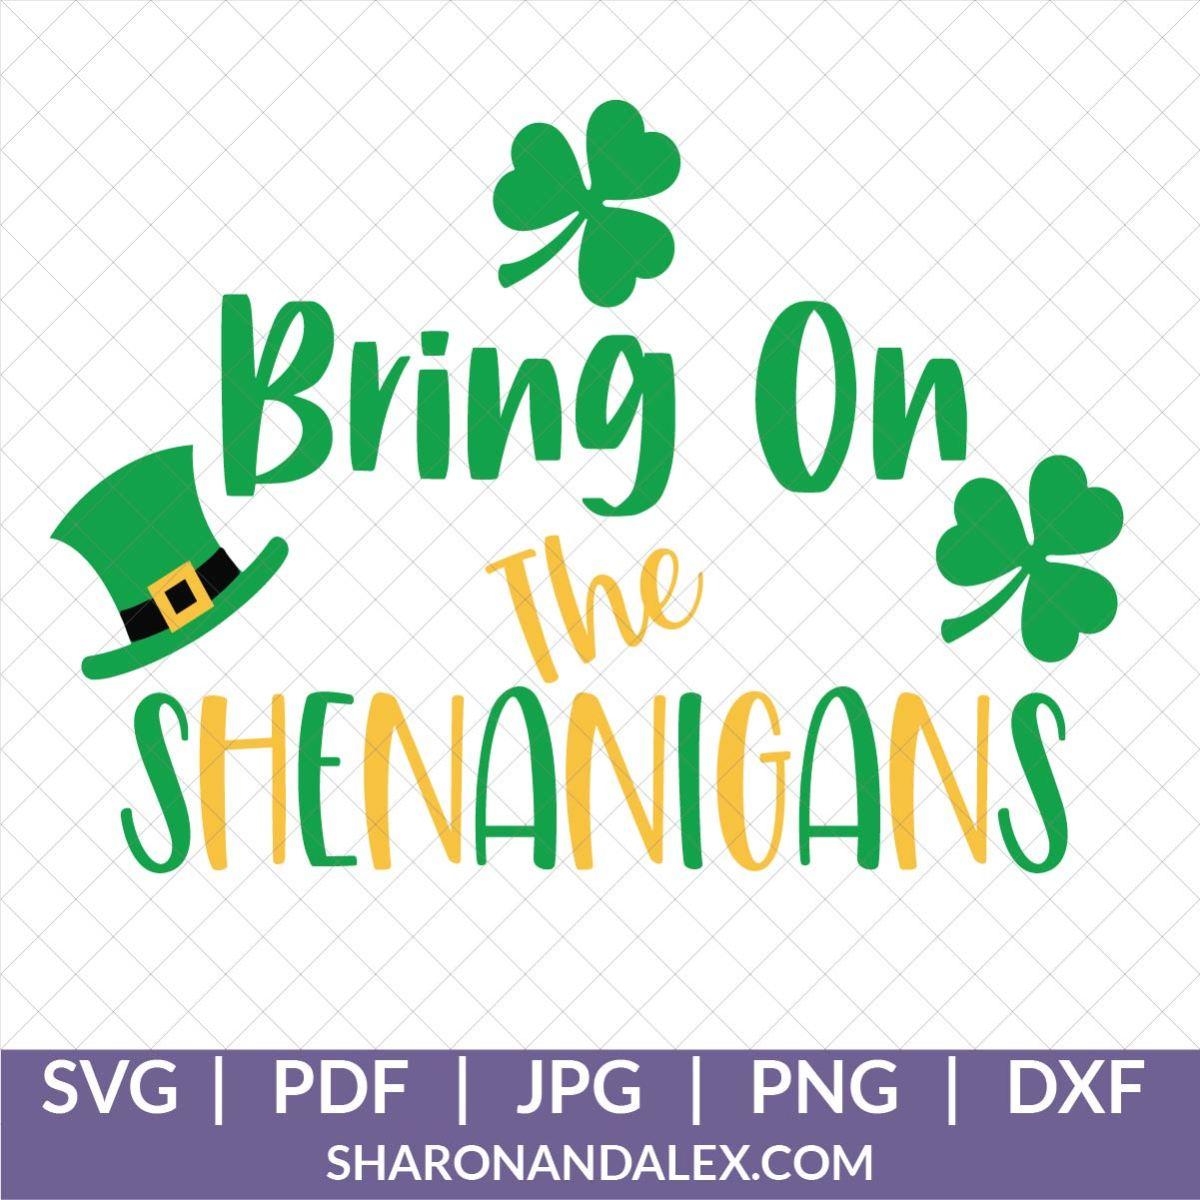 bring on the shenanigans